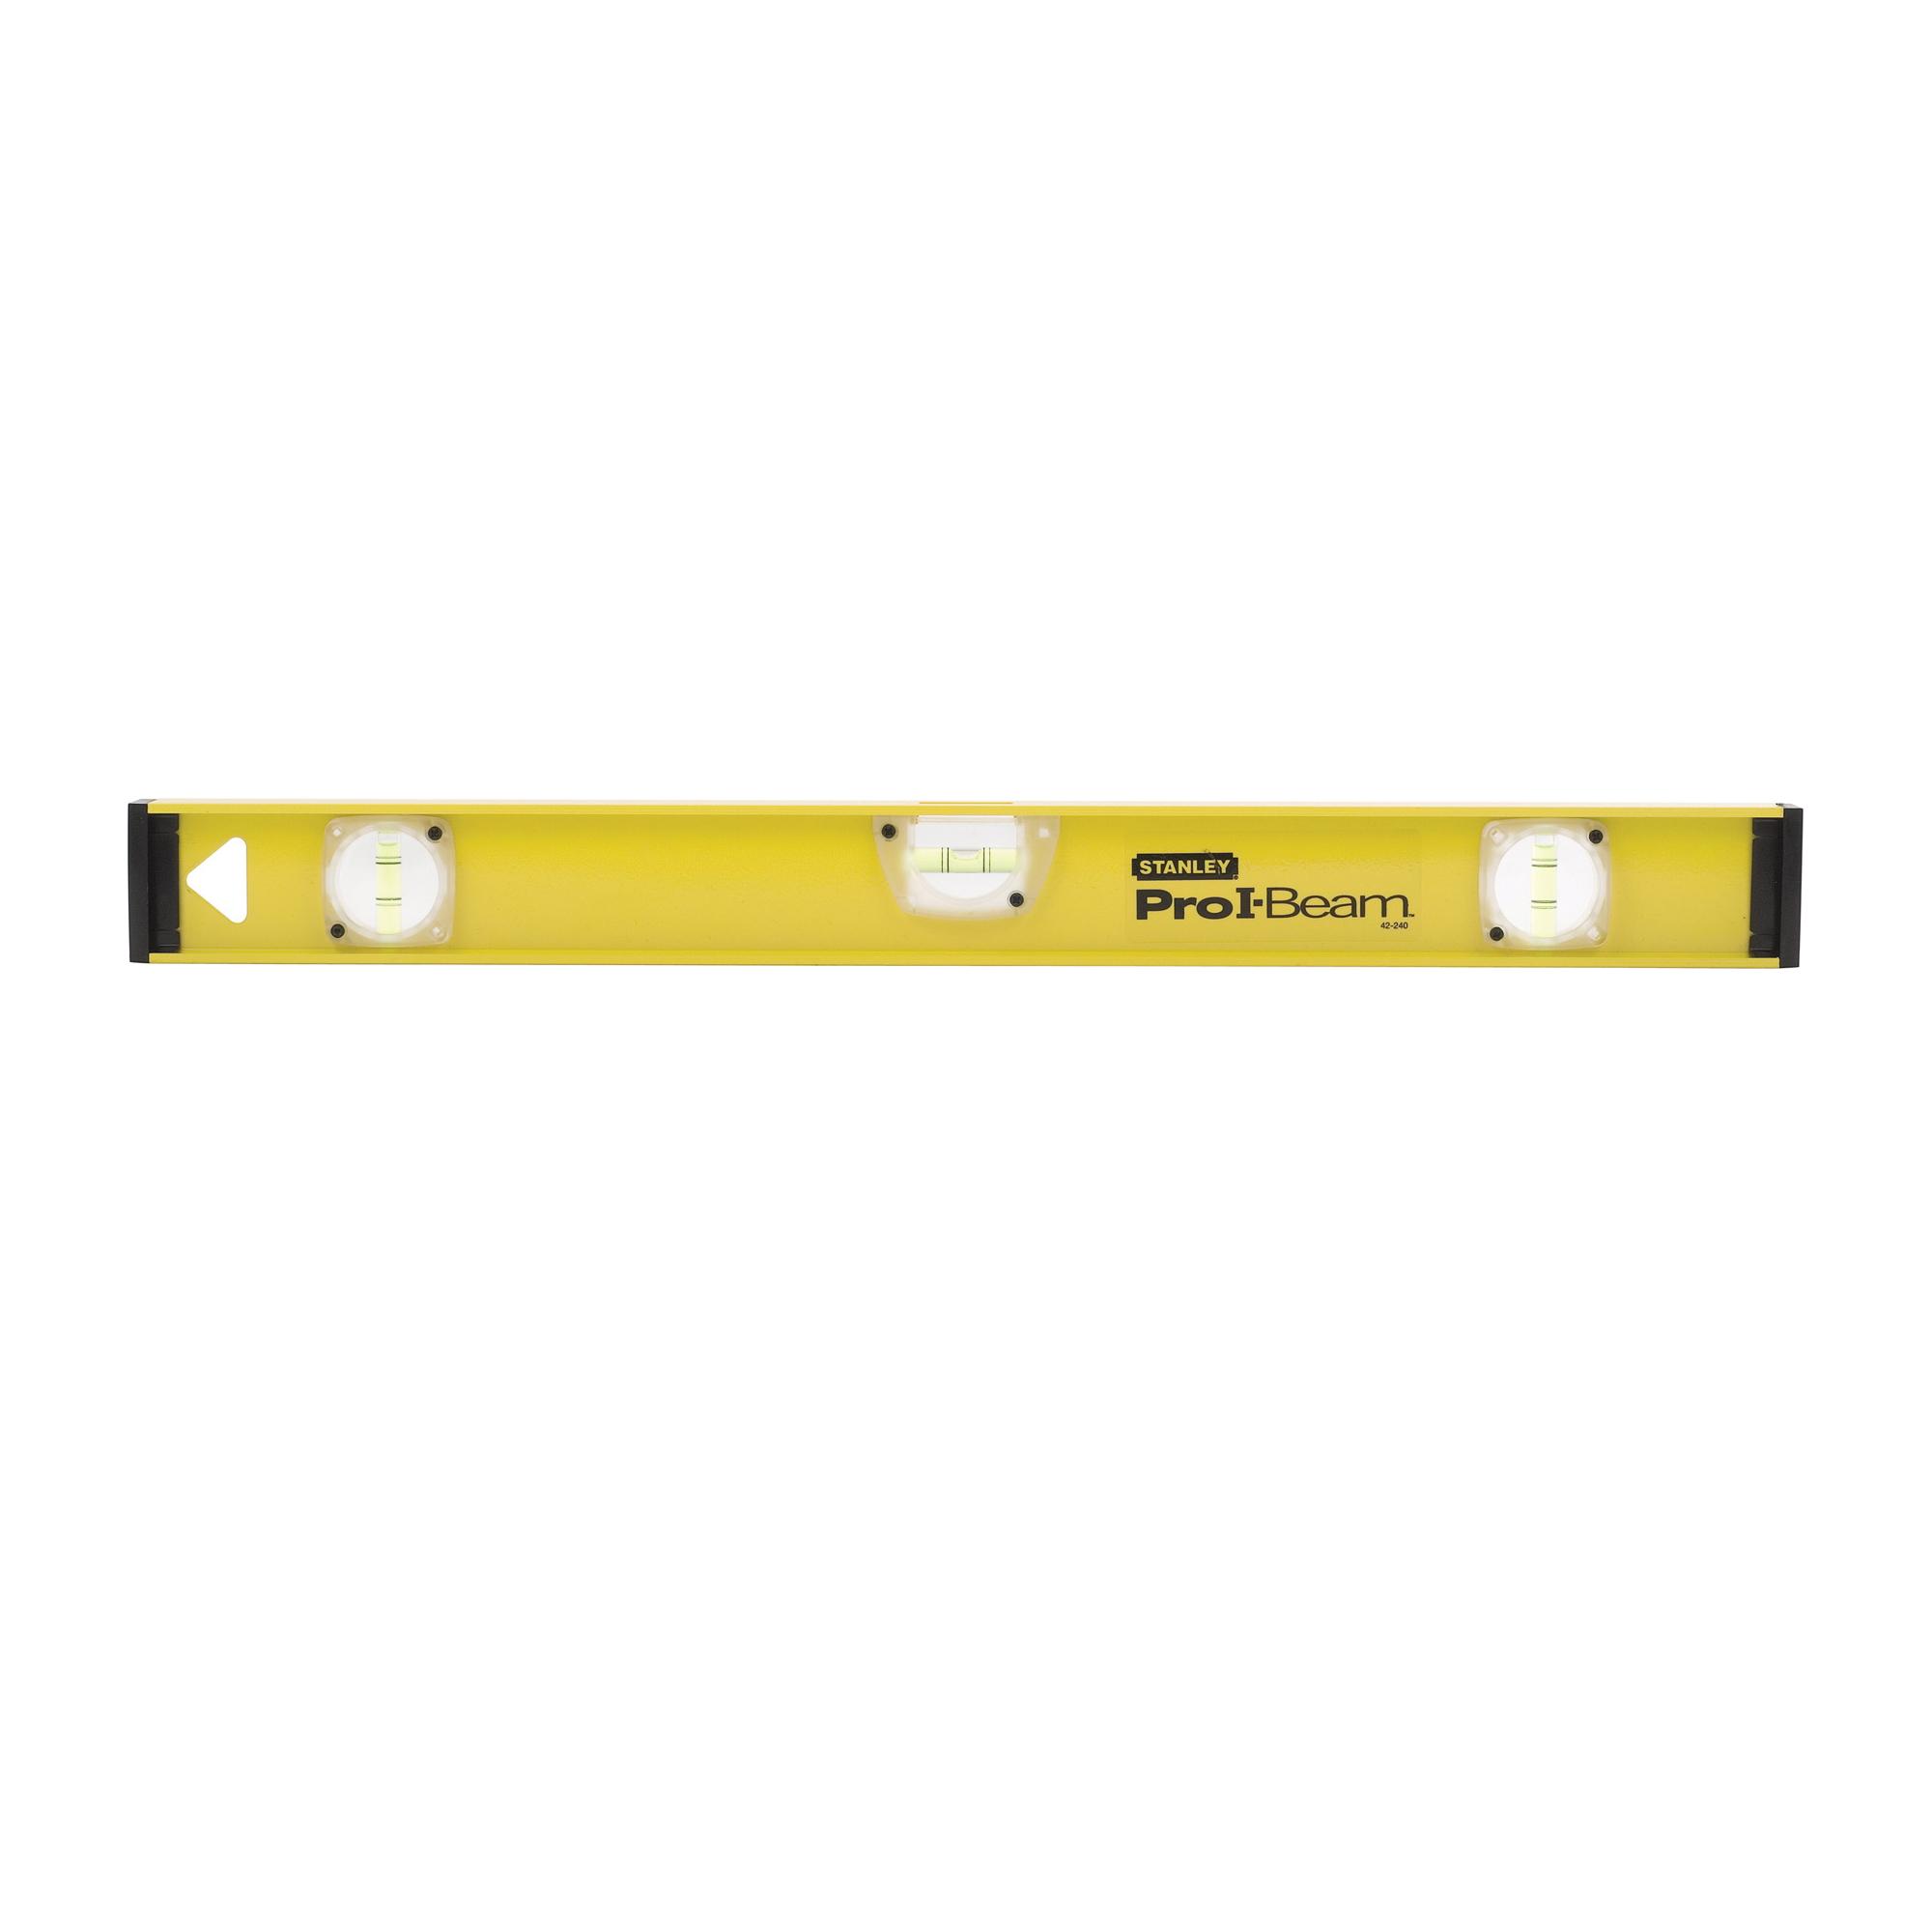 Stanley® Pro I-Beam™ 42-240 Non-Magnetic Professional I-Beam Level, 24 in L, 3 Vials, (1) Level, (2) Plumb Vial Position, 0.0015 in/in, Aluminum